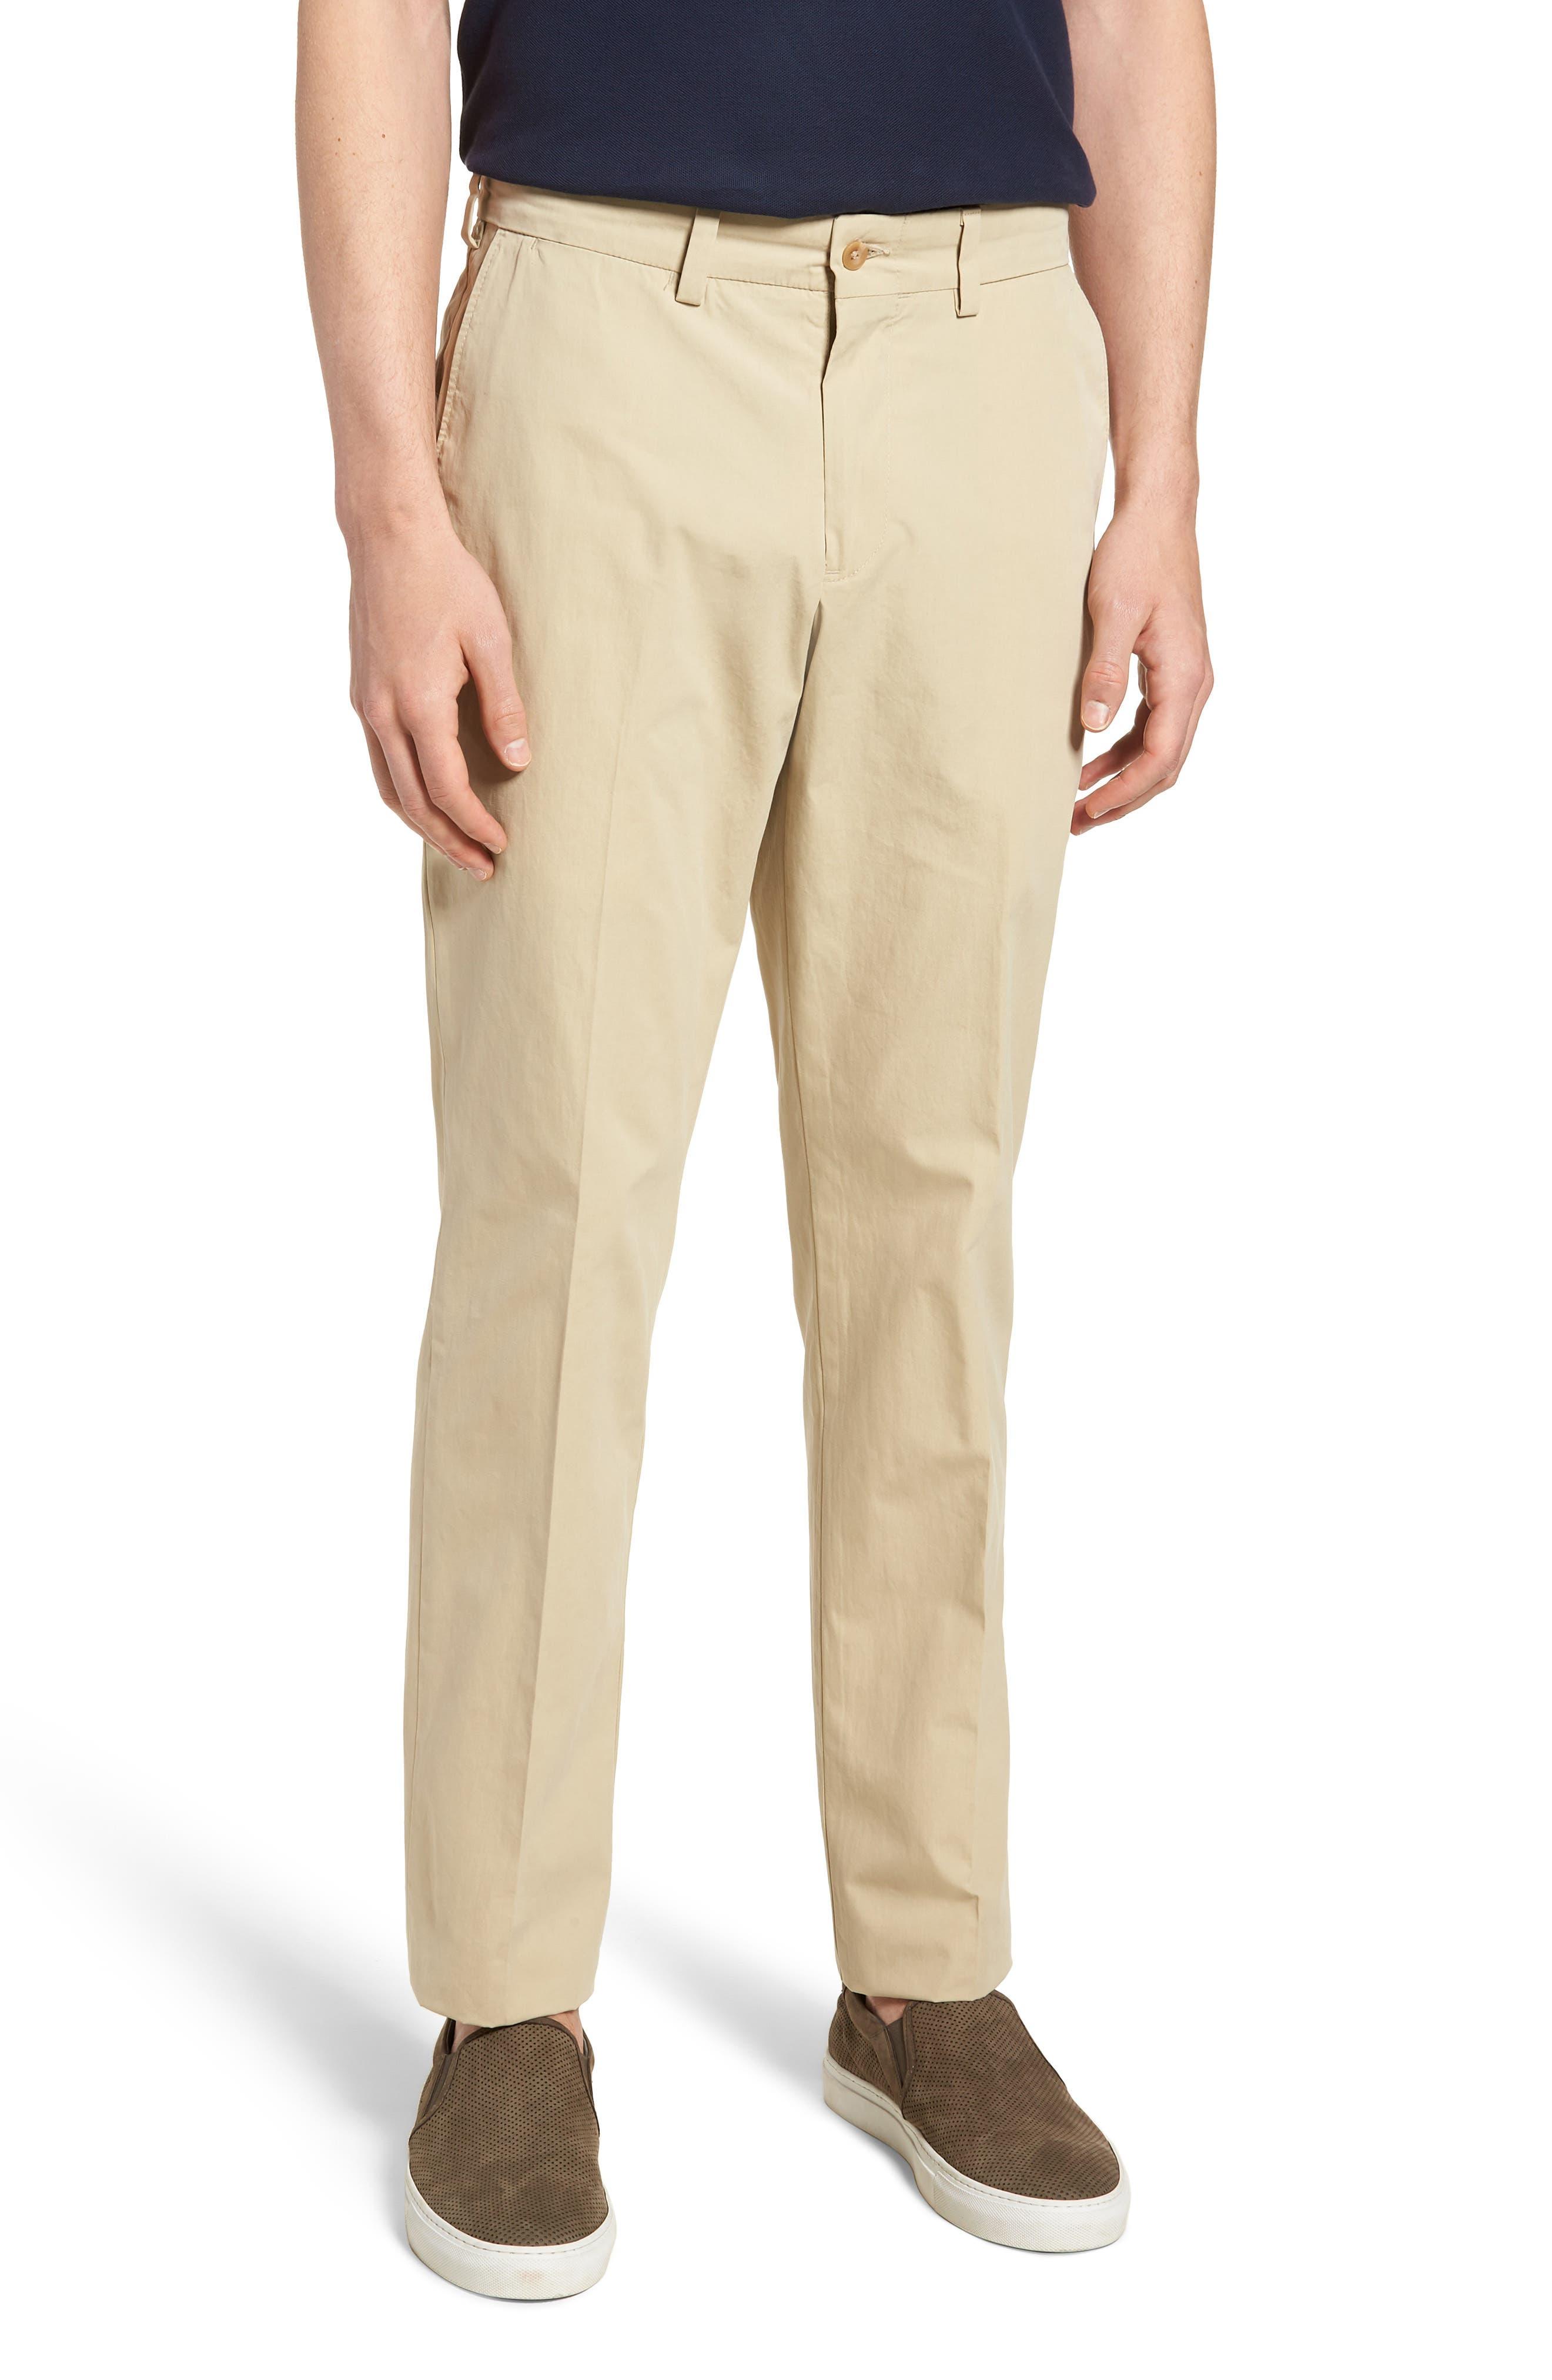 M3 Straight Fit Flat Front Tropical Poplin Pants,                         Main,                         color, Khaki